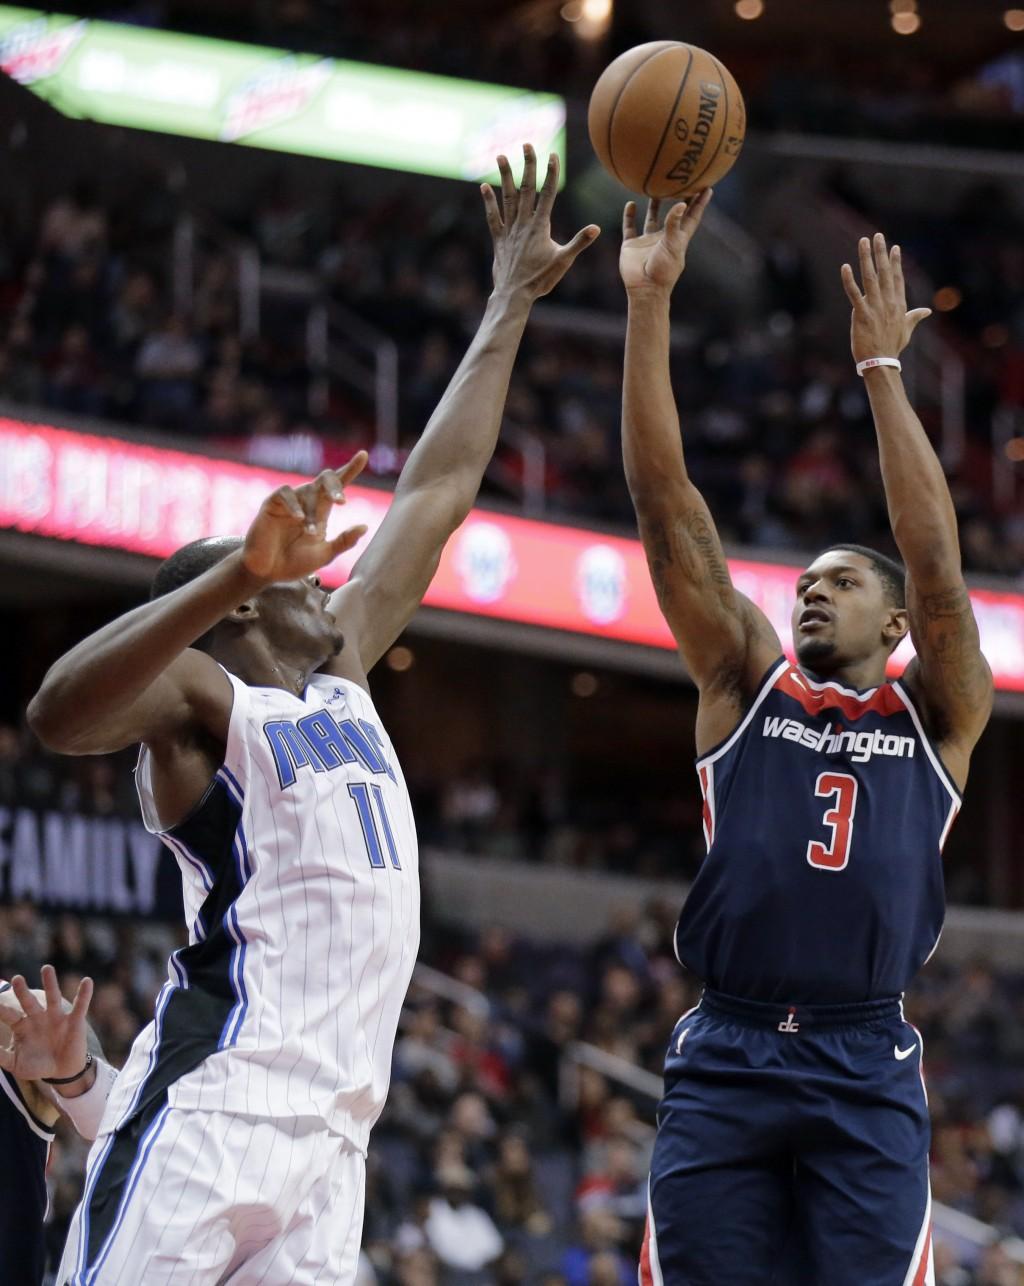 Washington Wizards guard Bradley Beal (3) shoots over Orlando Magic center Bismack Biyombo (11) during the second half of an NBA basketball game Satur...